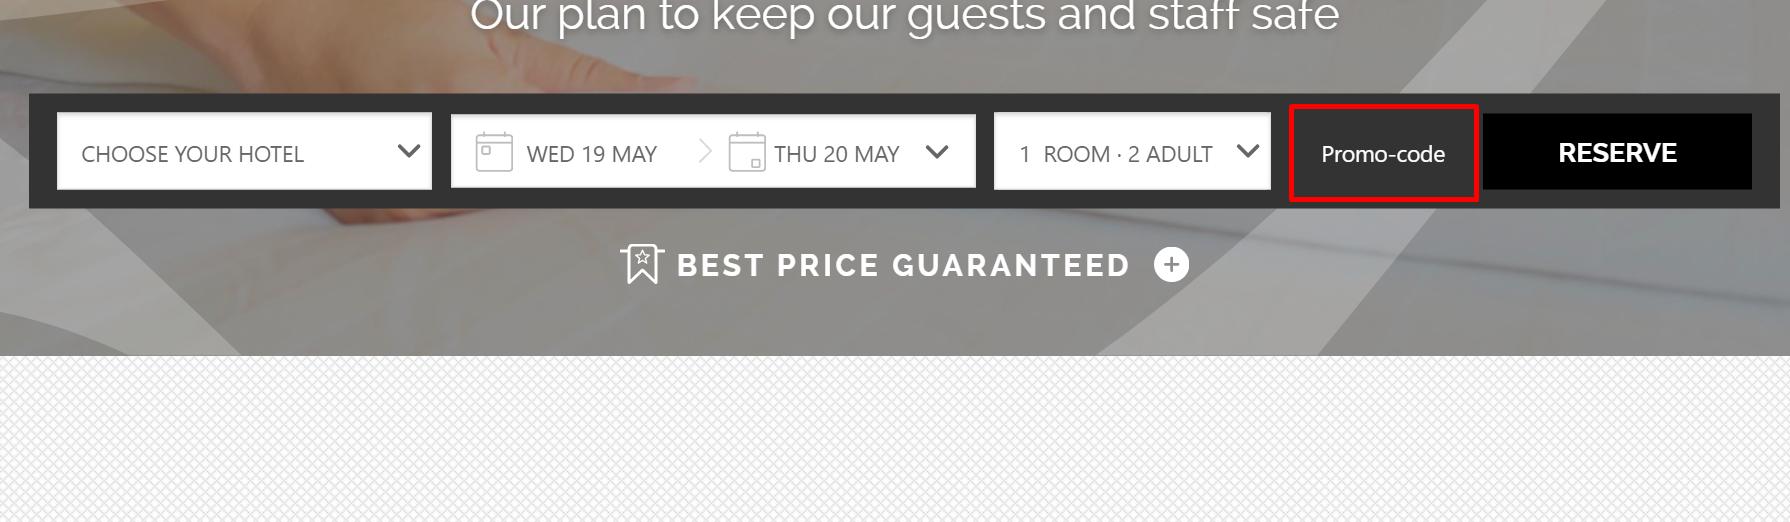 How do I use my Abba Hotels promo code?